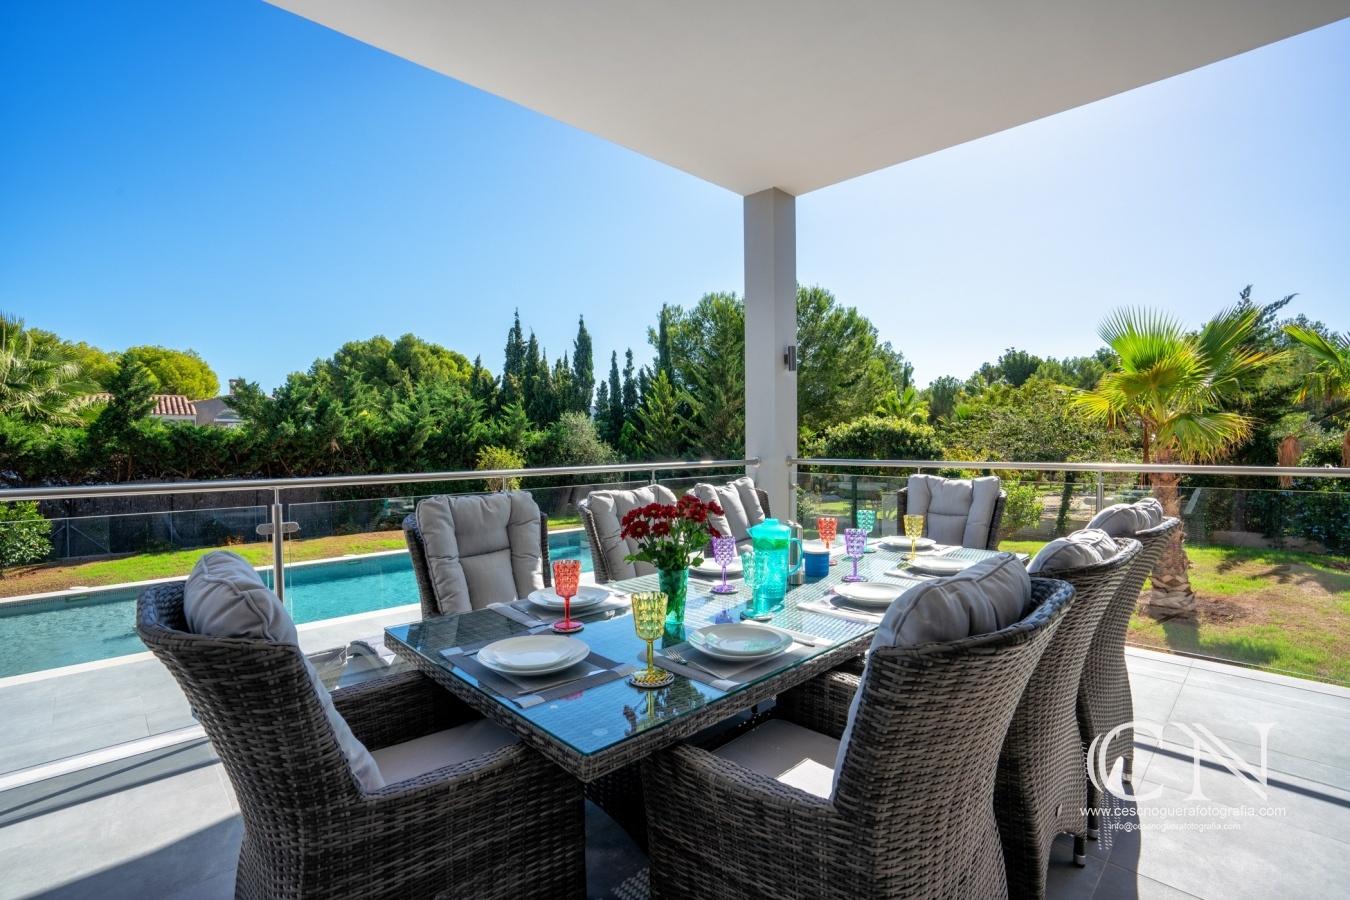 Casa a Sol de Mallorca - Cesc Noguera Photography, Architectural & Interior design photographer / Landscape Photography